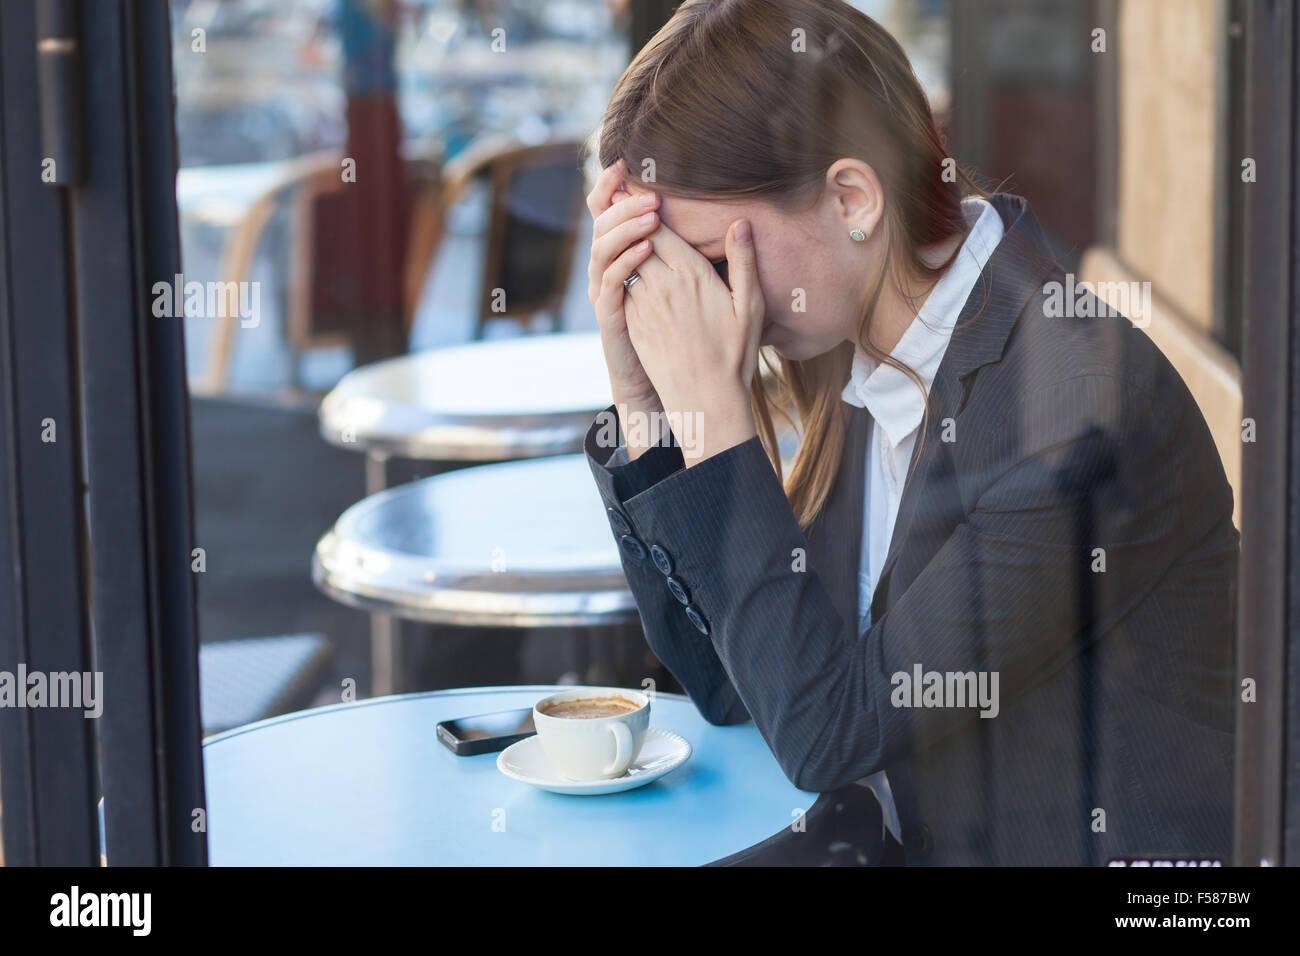 Femme pleurer dans cafe Photo Stock